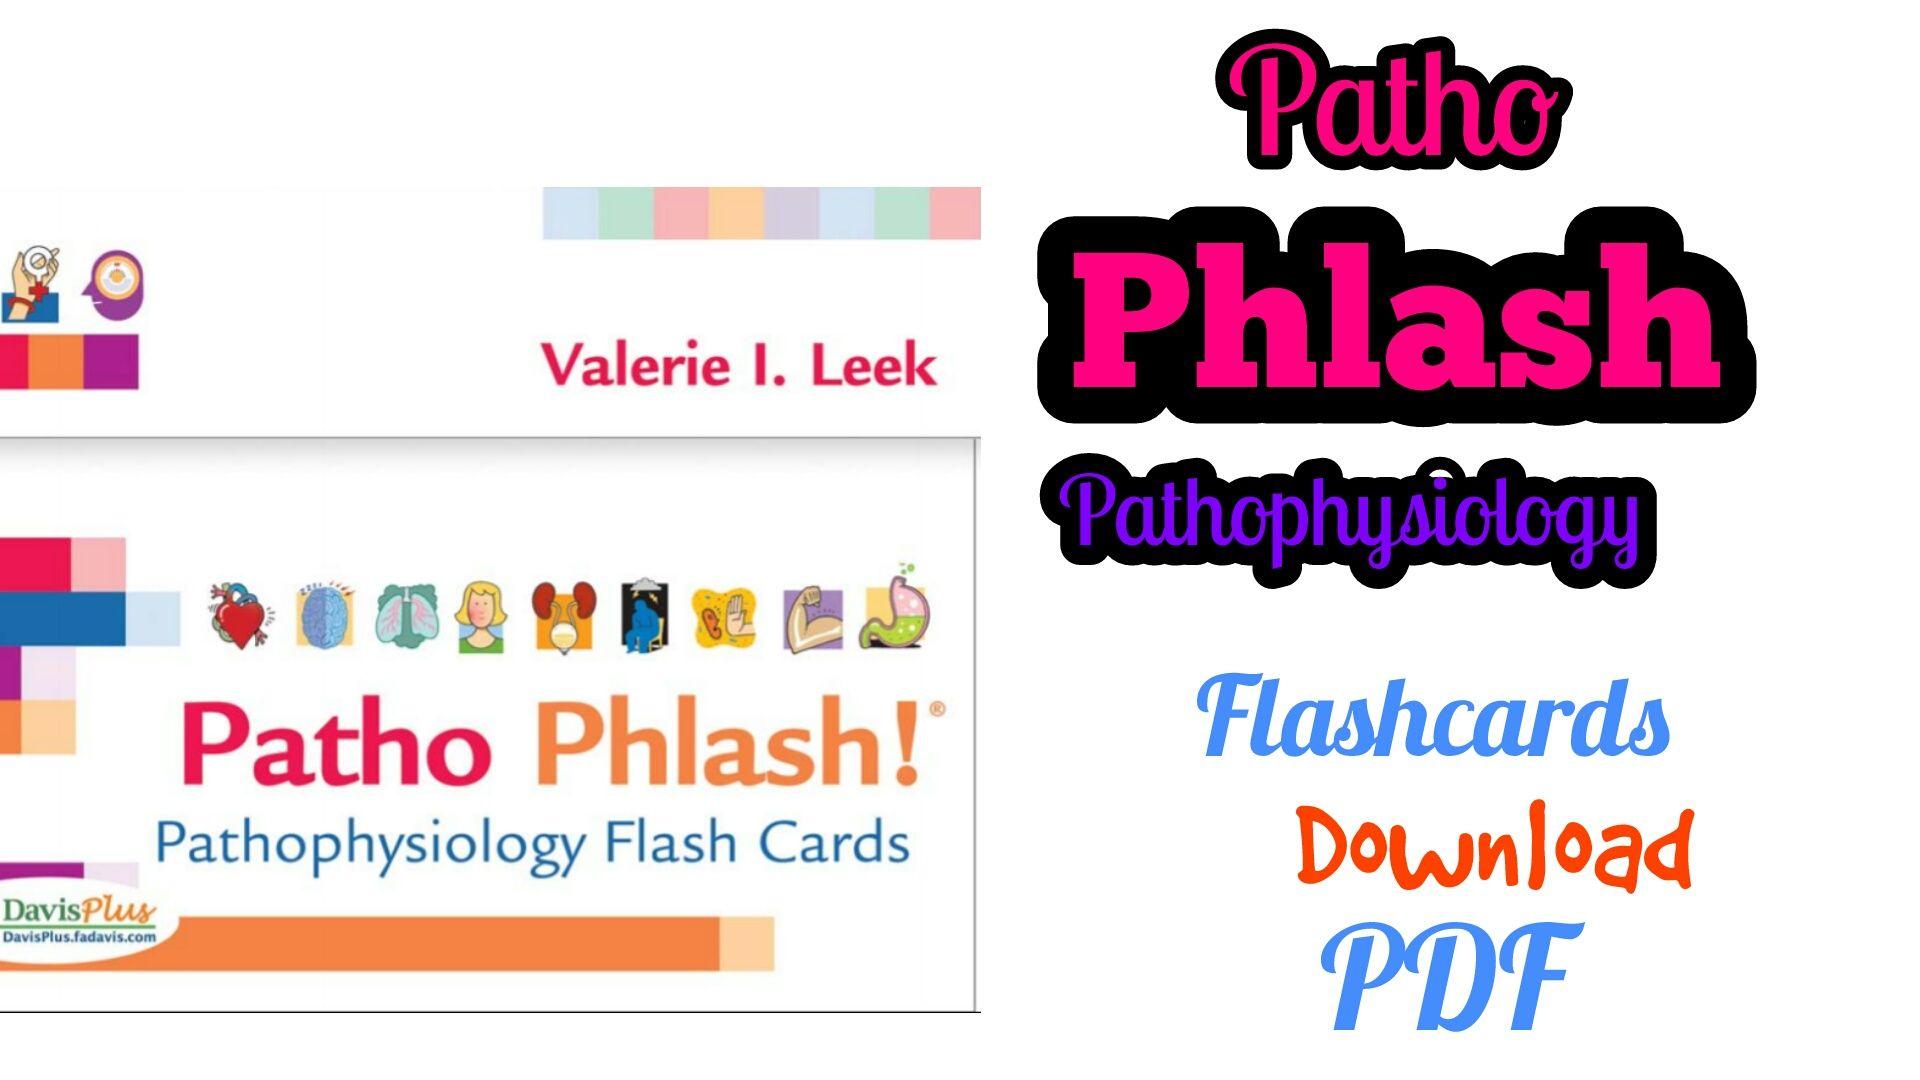 Patho Phlash! Pathophysiology Flash Cards eBook [PDF